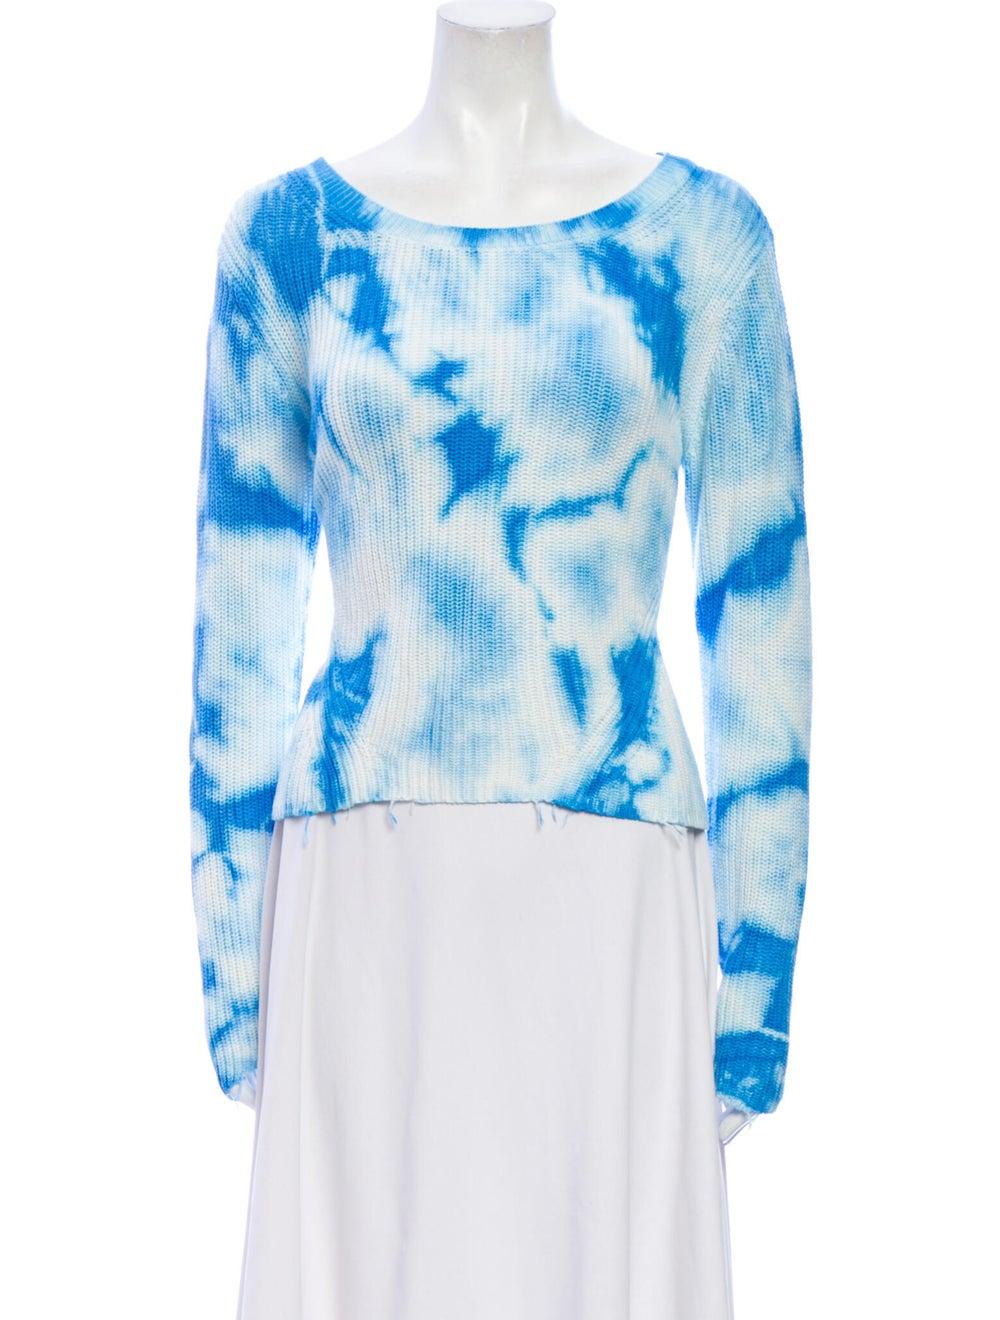 Raffi Tie-Dye Print Scoop Neck Sweater Blue - image 1